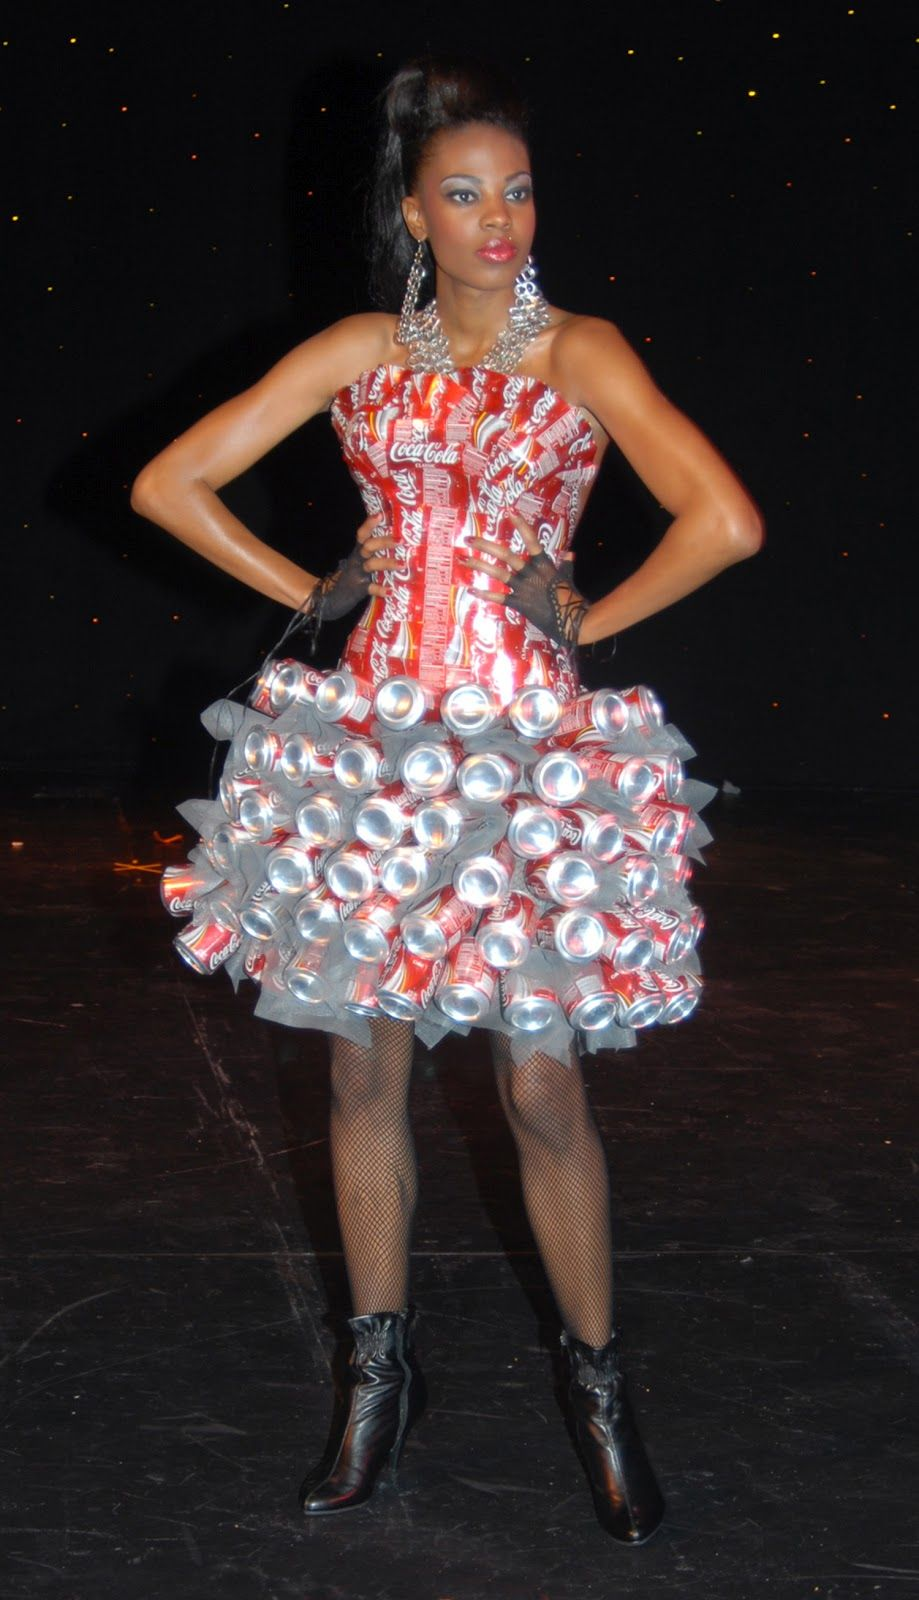 Recyclable Fashion: Trash Fashion - Google Search